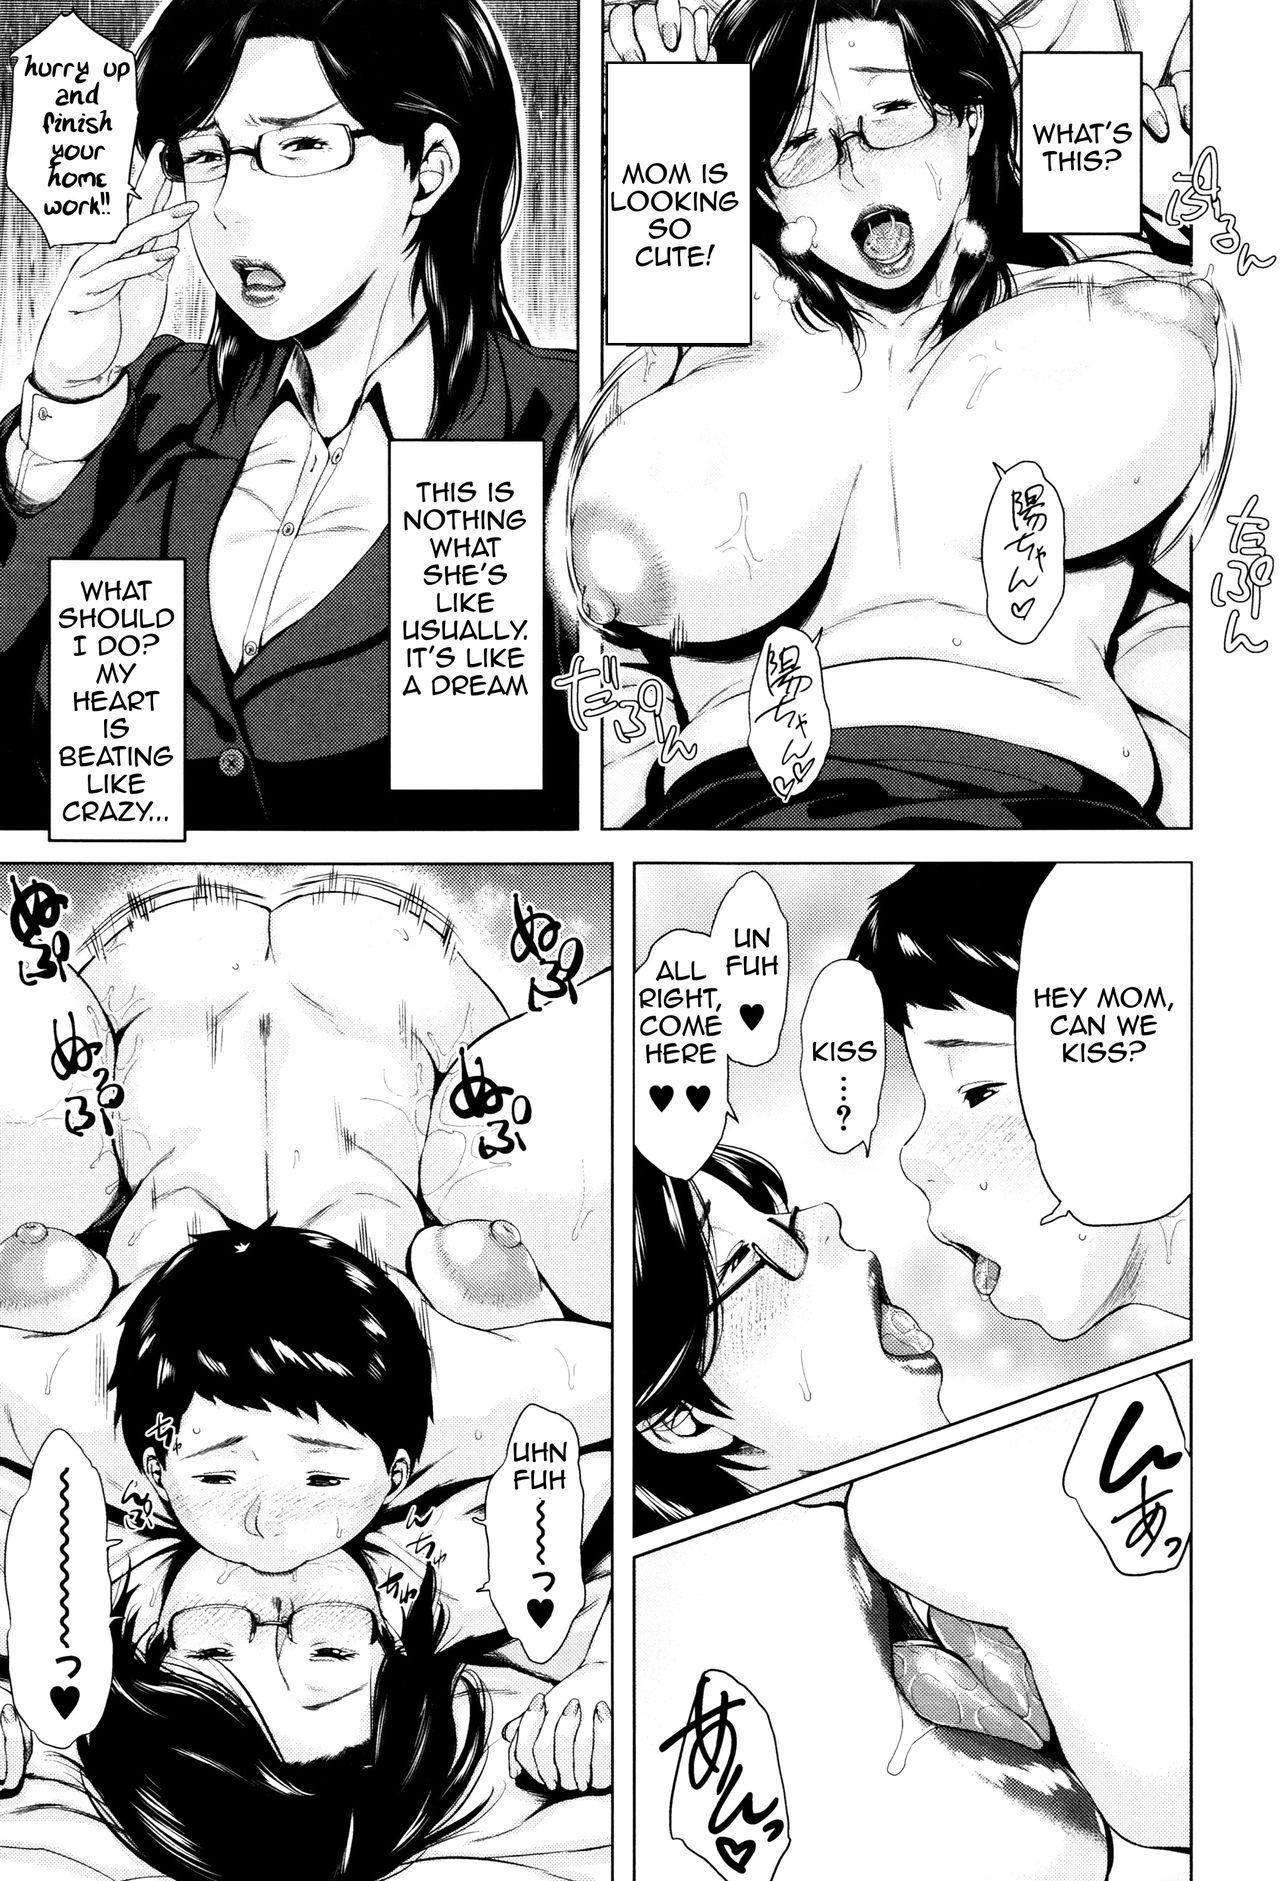 [Jitsuma] Kinyoubi no Haha-tachi e - To Friday's mothers [English] [Amoskandy, desudesu, Kusanyagi] 133